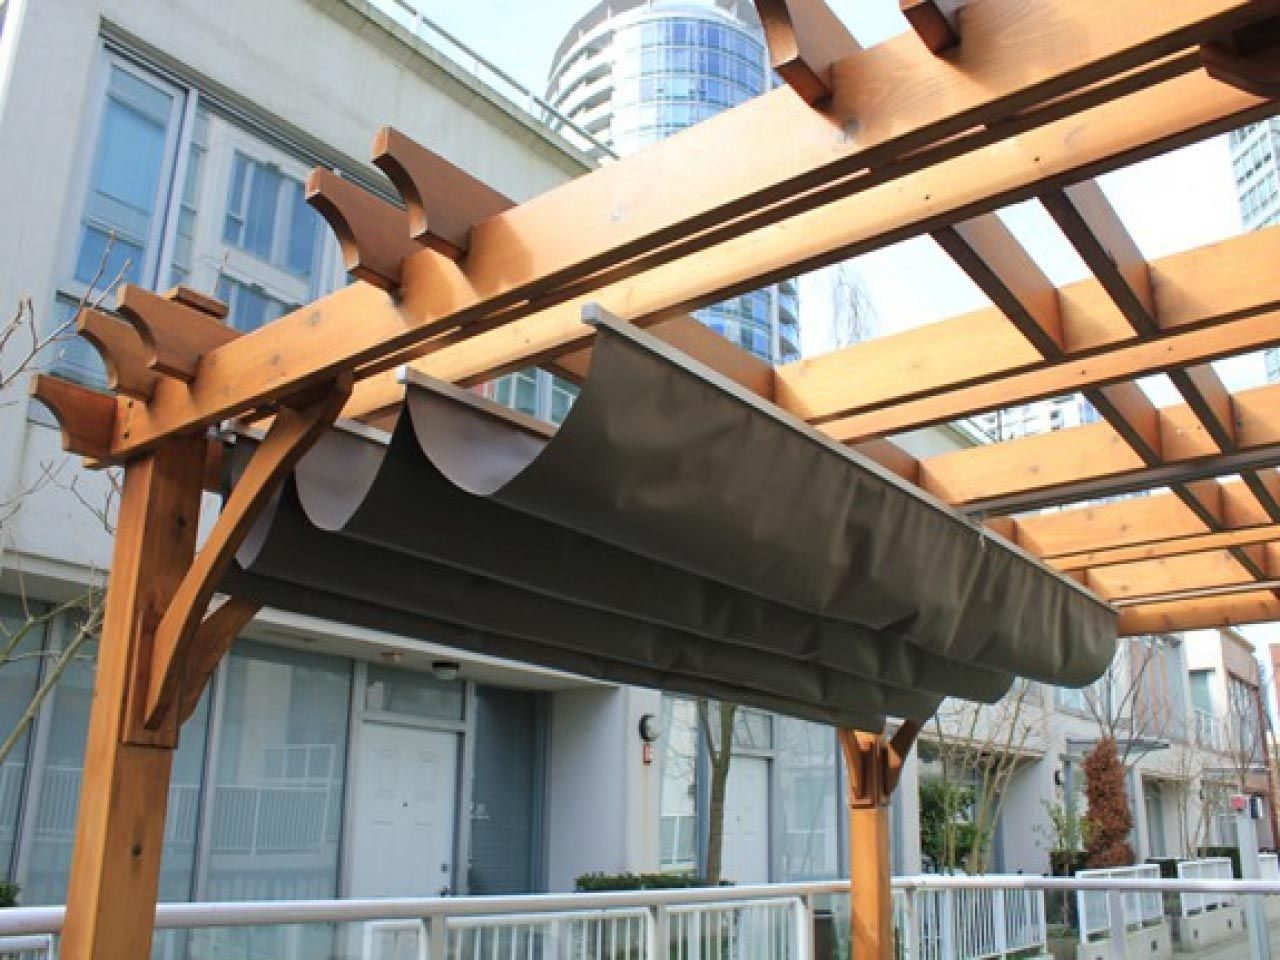 Retractable Pergola Canopy Cover | bestpergolaideas.com ... on Canvas Sun Shade Pergola id=68645